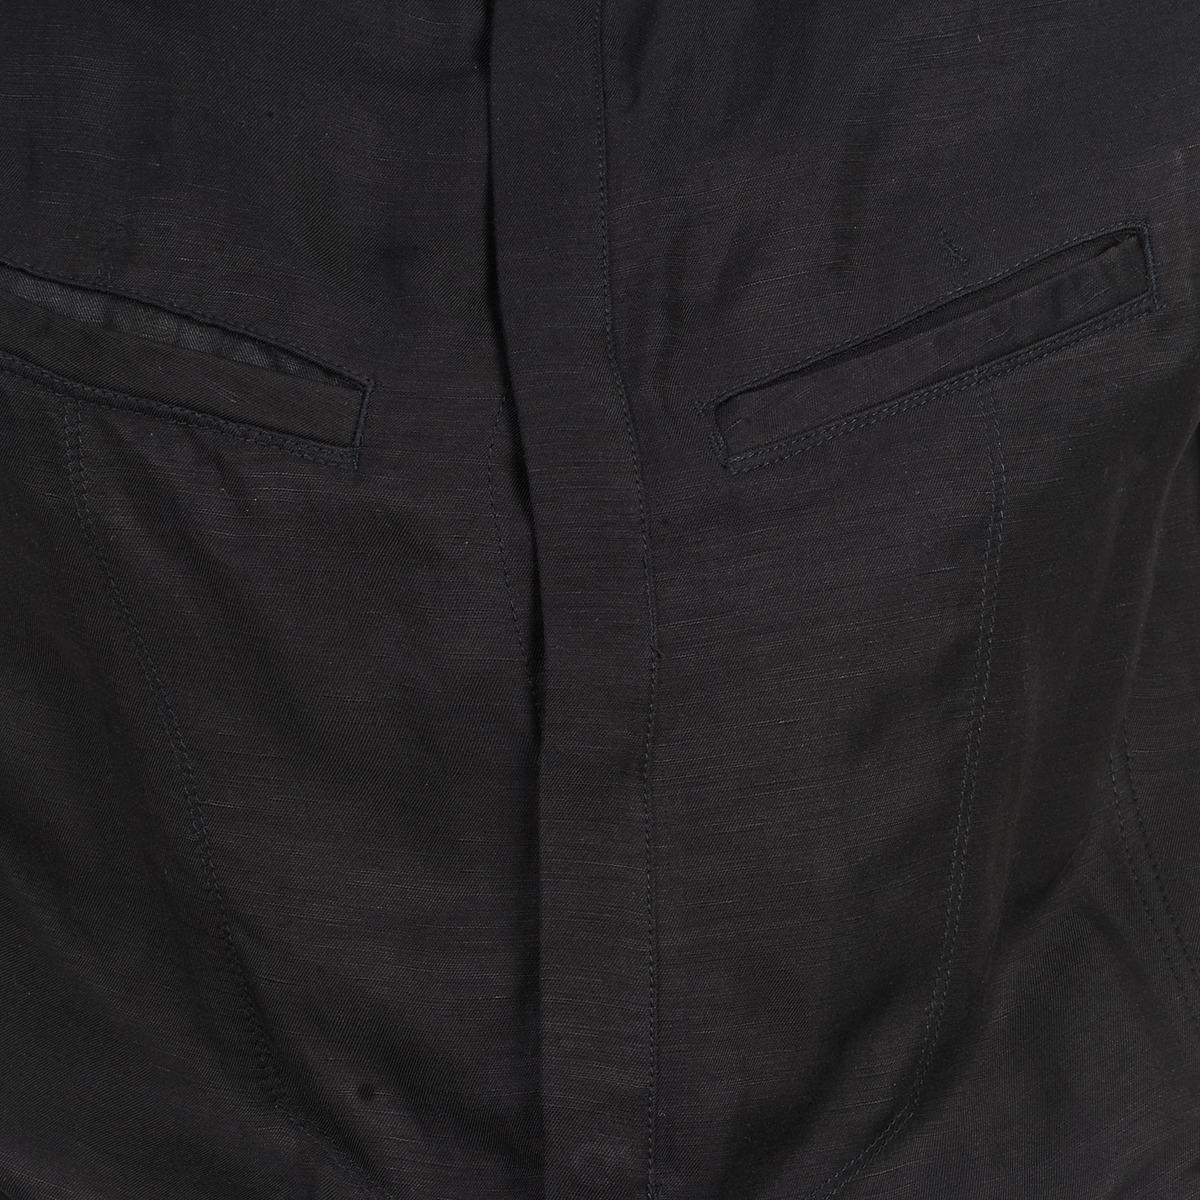 fdae8f31f445 G-Star RAW Pavan Summer Dress Women s Dress In Black in Black - Lyst